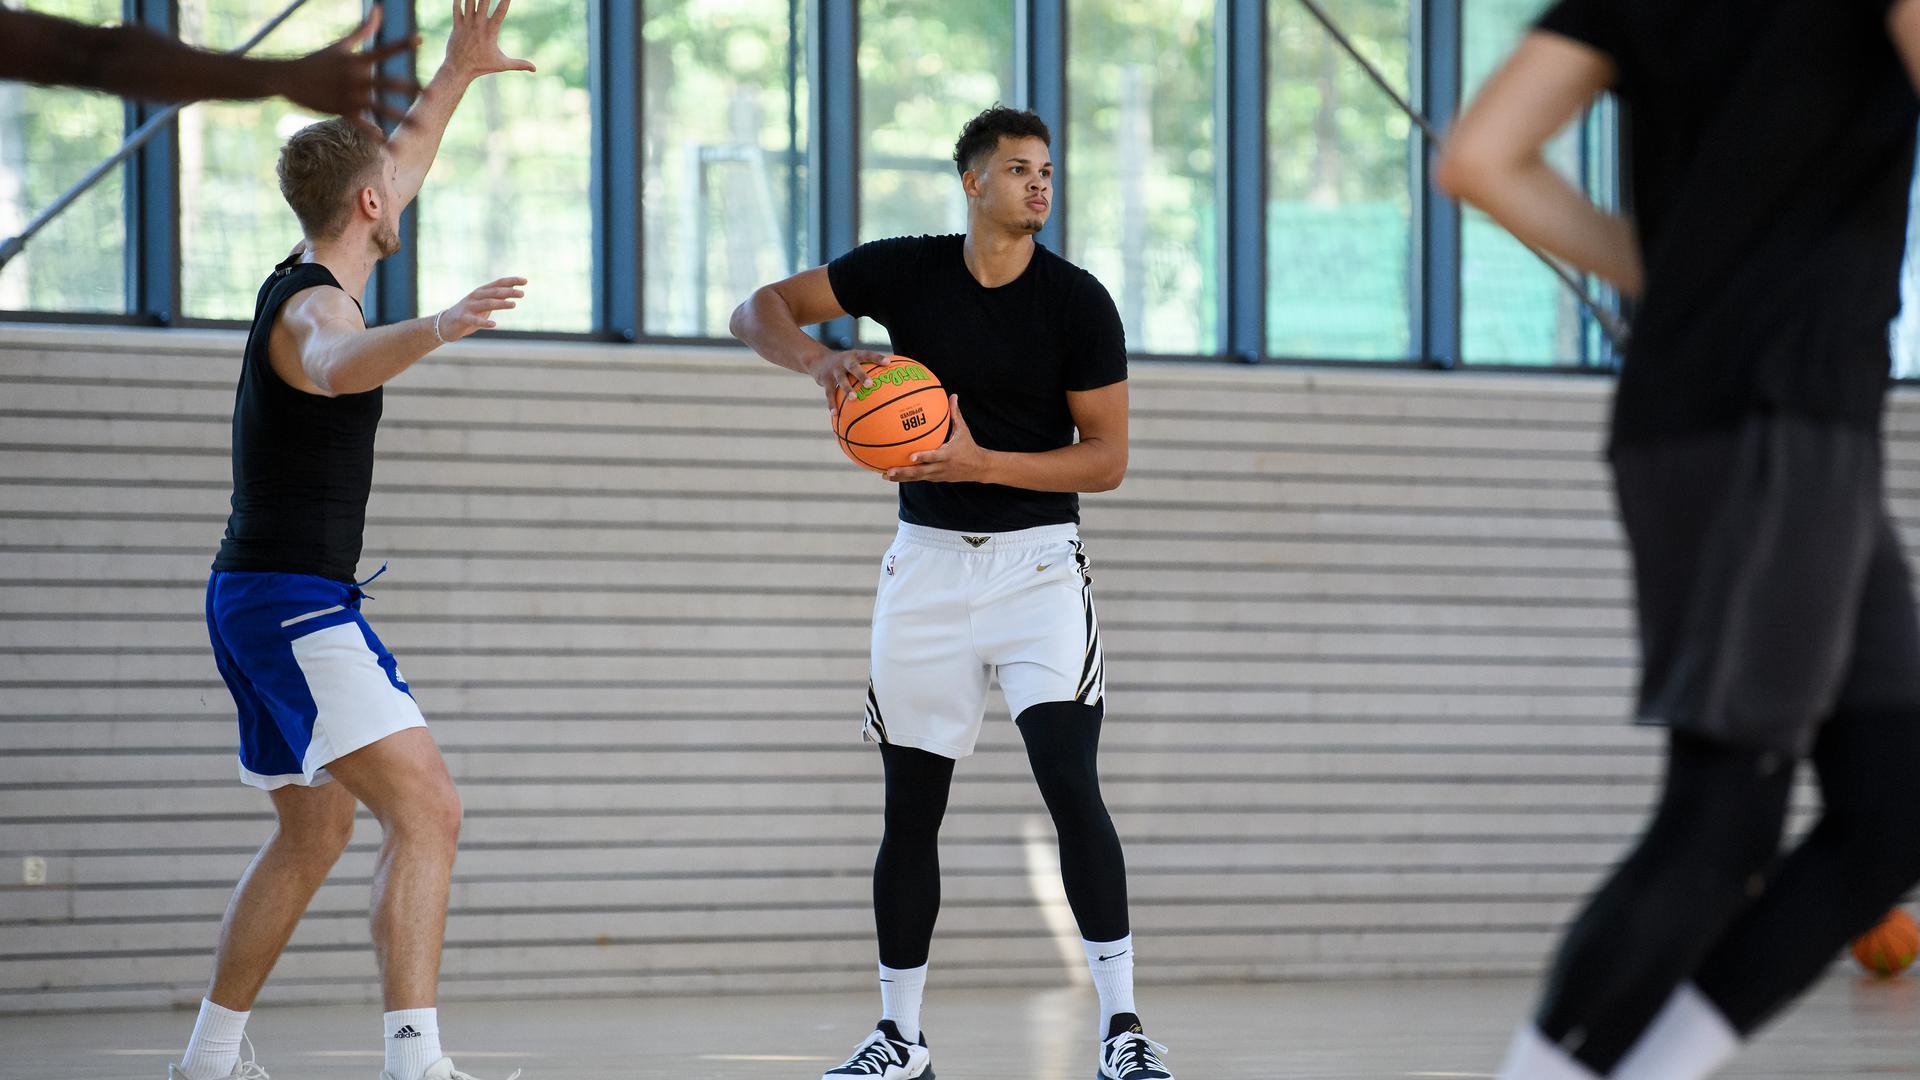 Maurice Pluskota am Ball.  GES/ Basketball/ ProA: PSK Lions - Auftakttraining, 07.09.2020 --